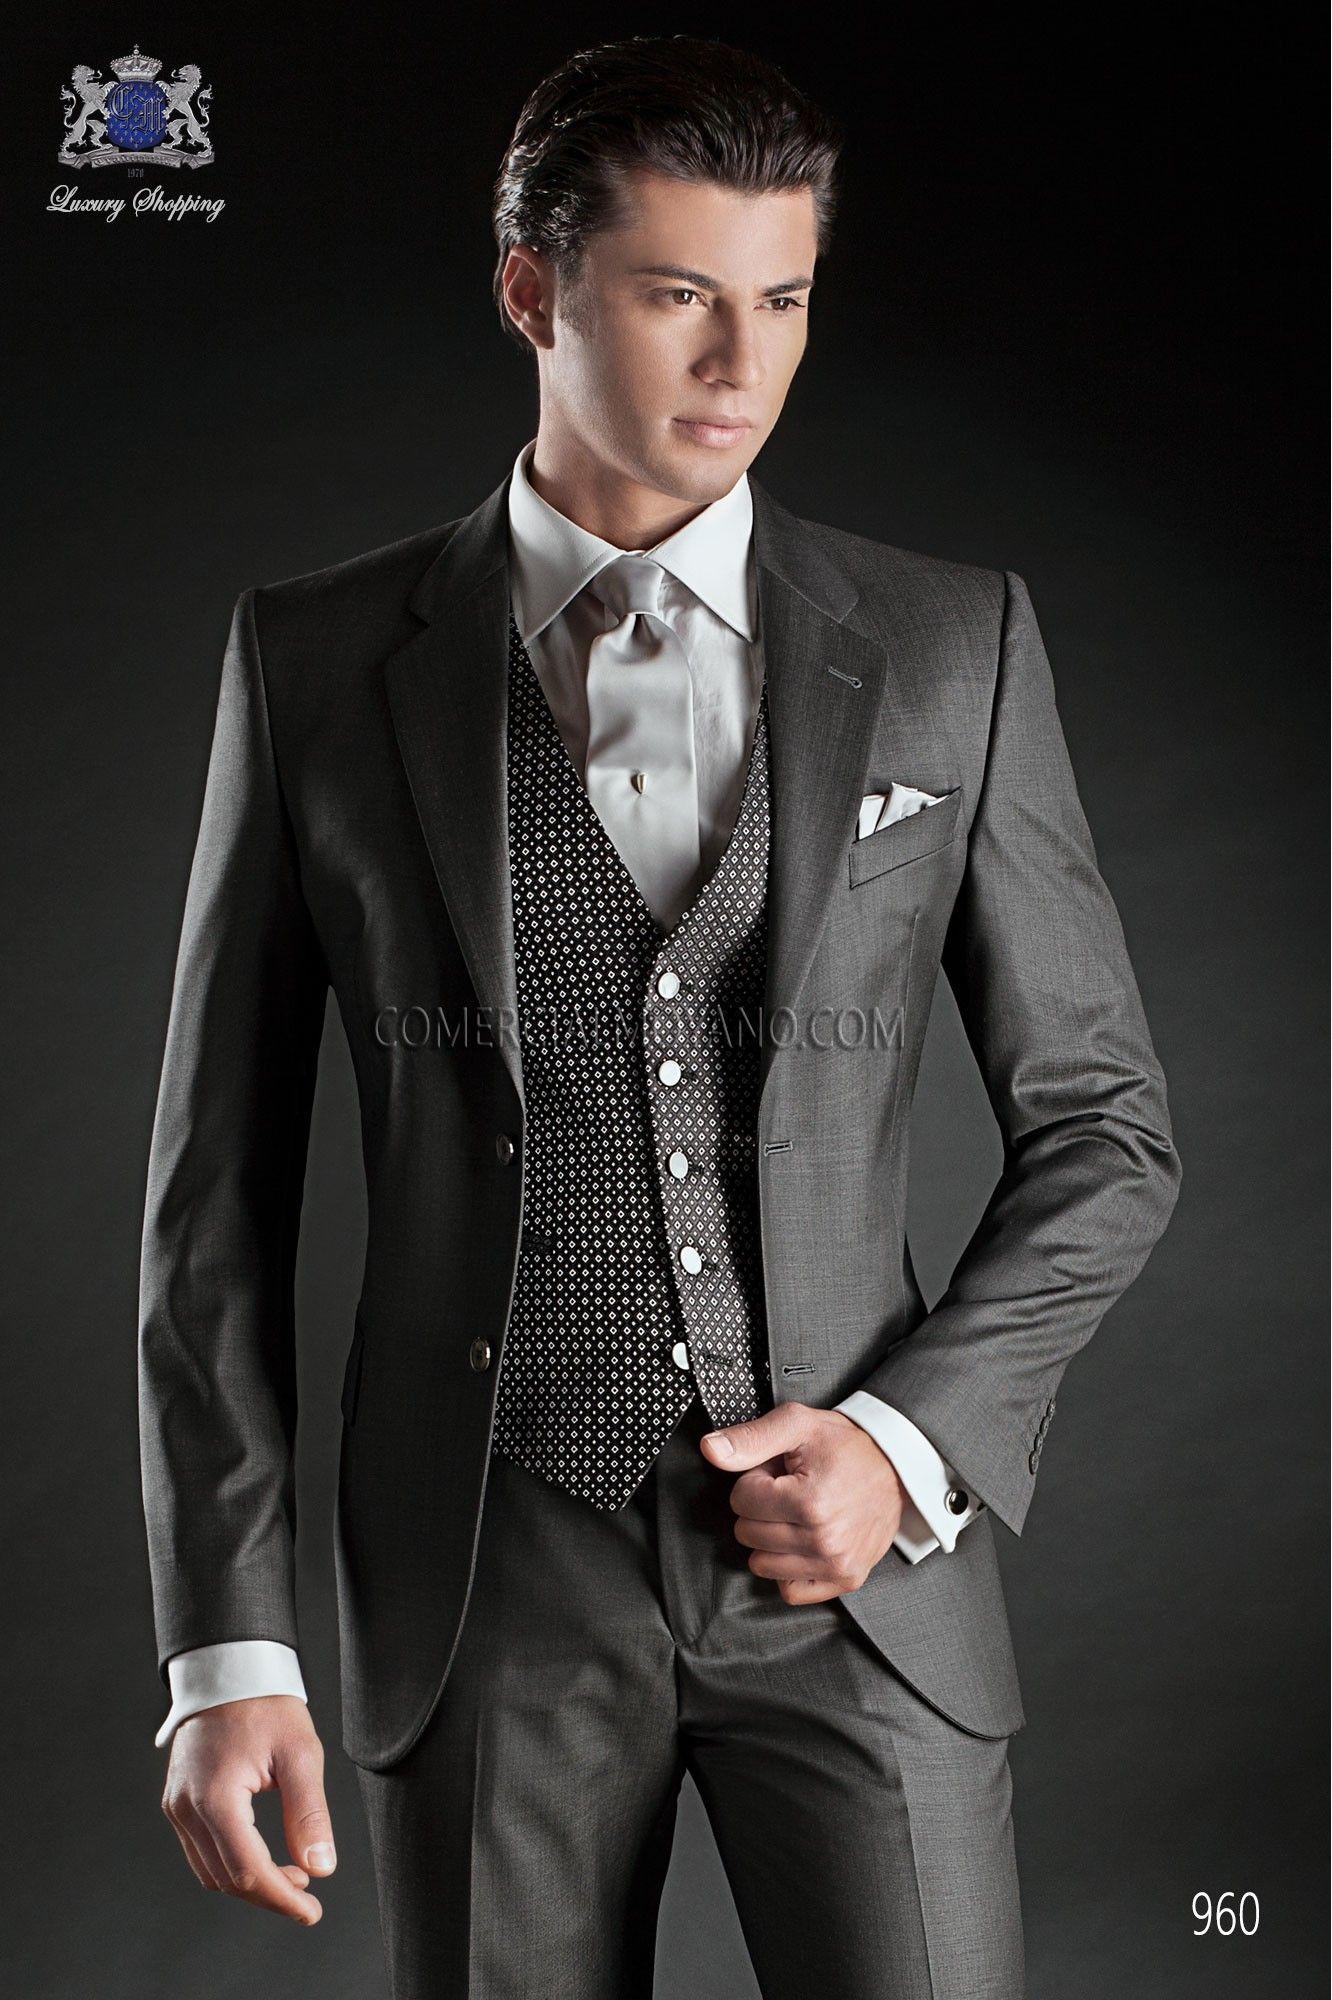 Pin by Bilal Sharif on Wedding Ideas | Pinterest | Men\'s suits ...